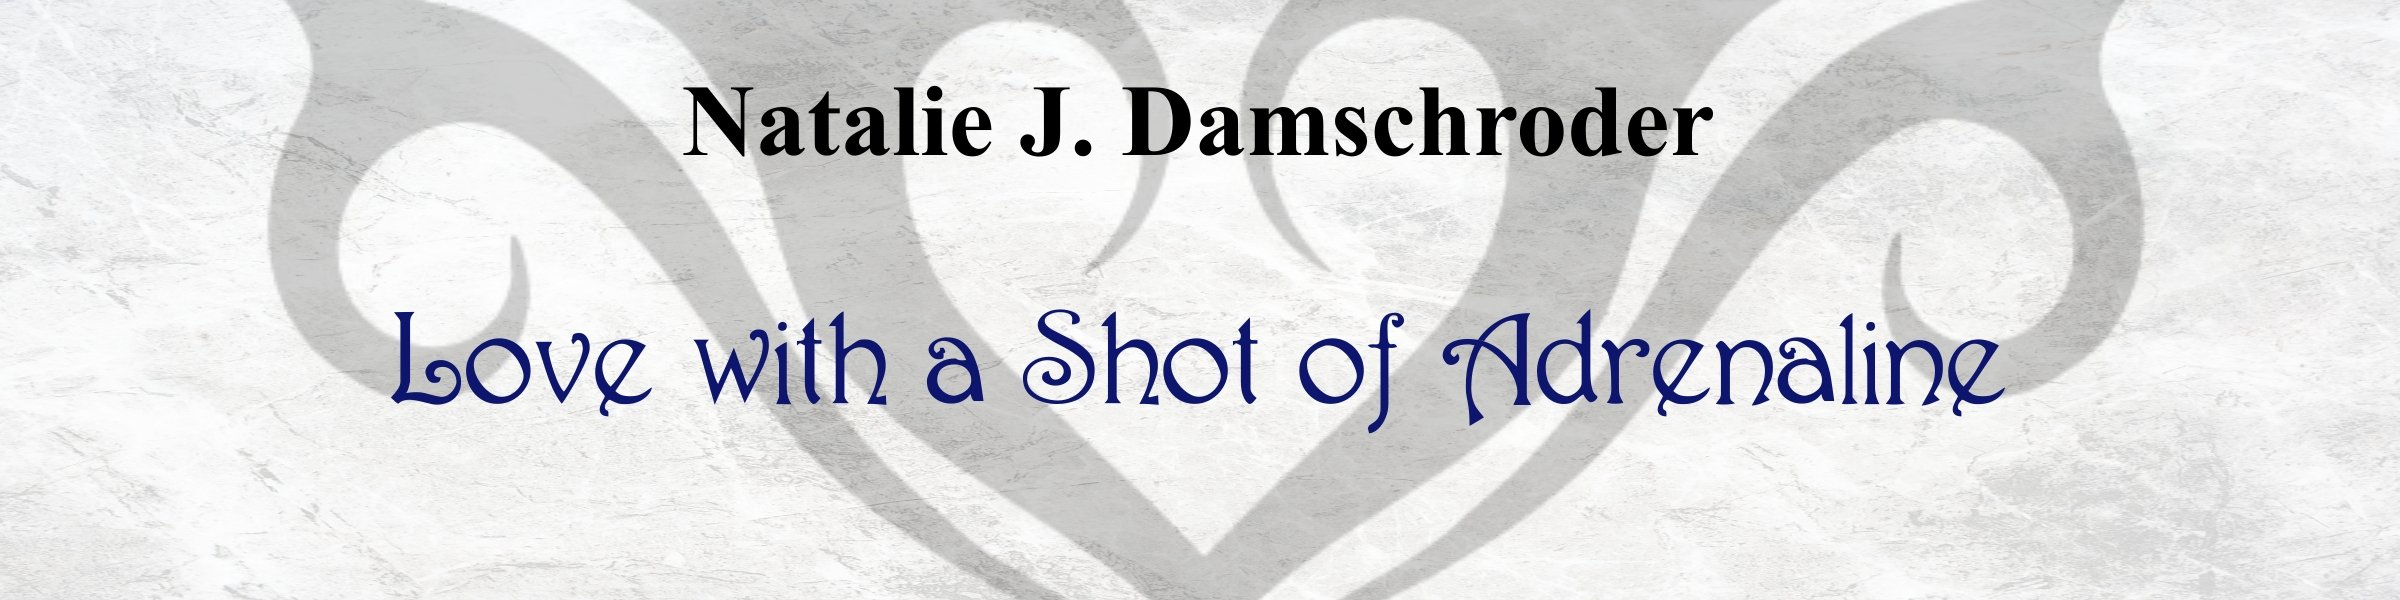 Natalie J. Damschroder ~ Love with a Shot of Adrenaline